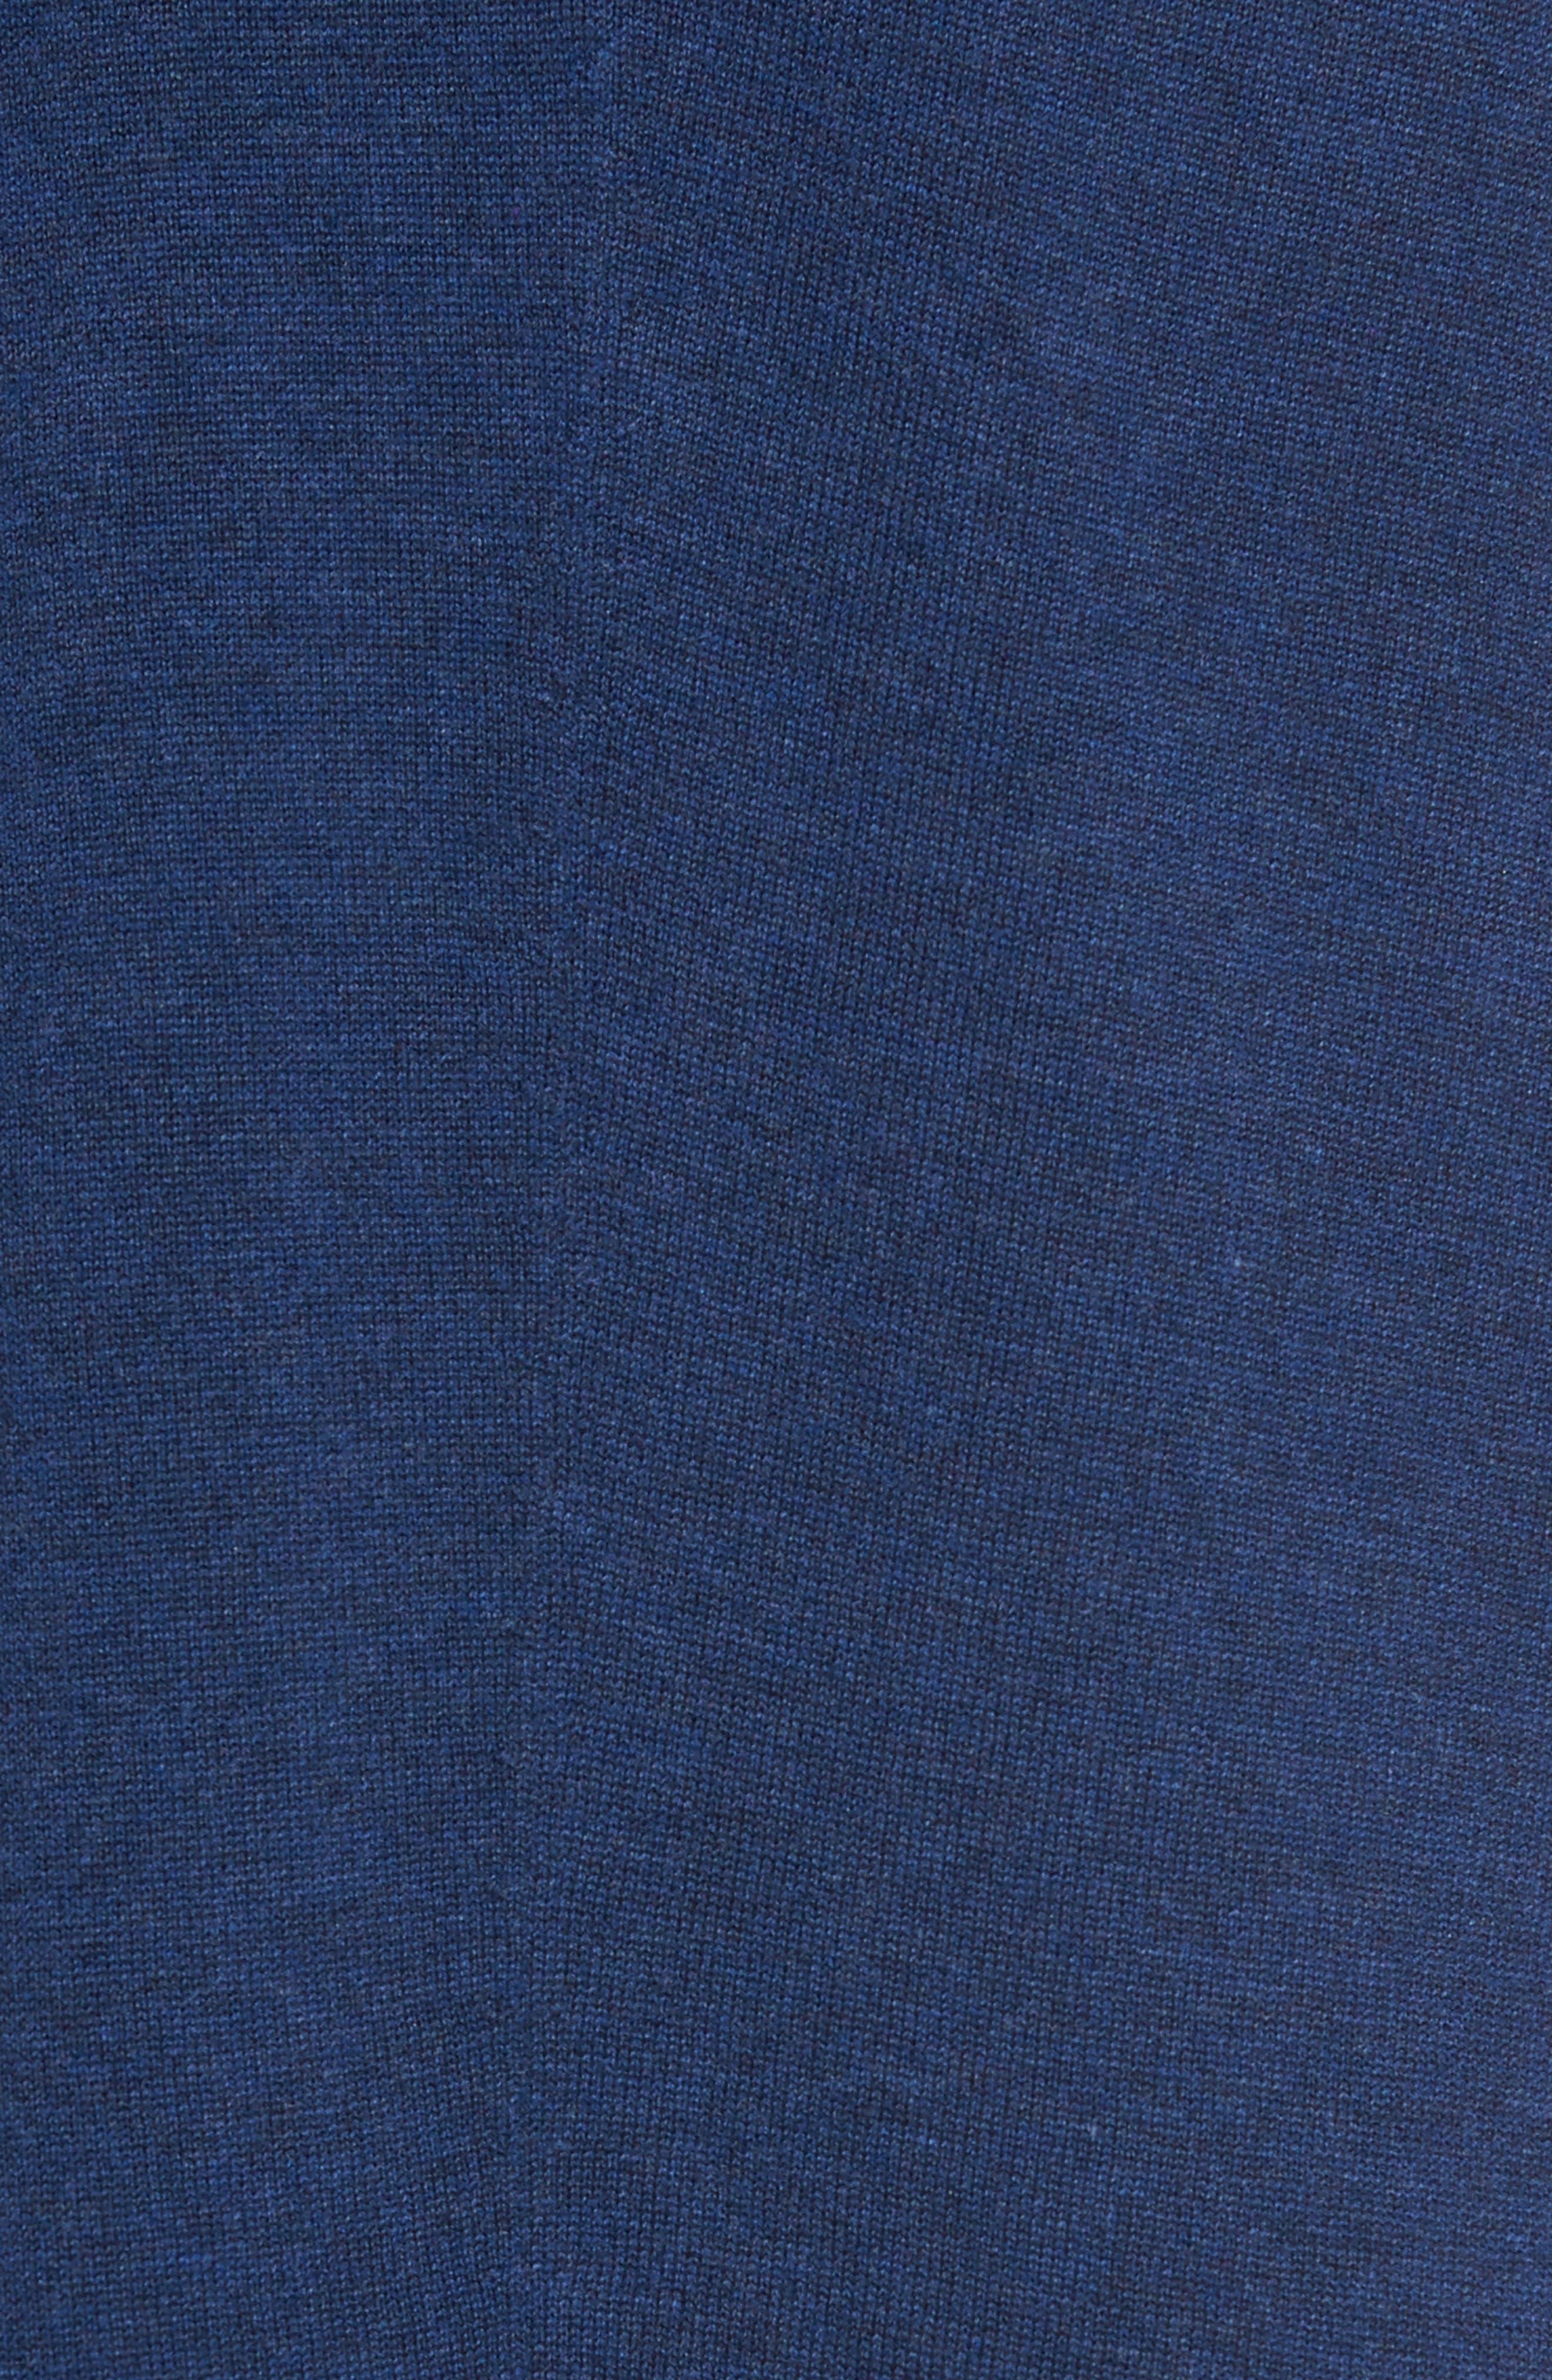 Layering Dress,                             Alternate thumbnail 5, color,                             403